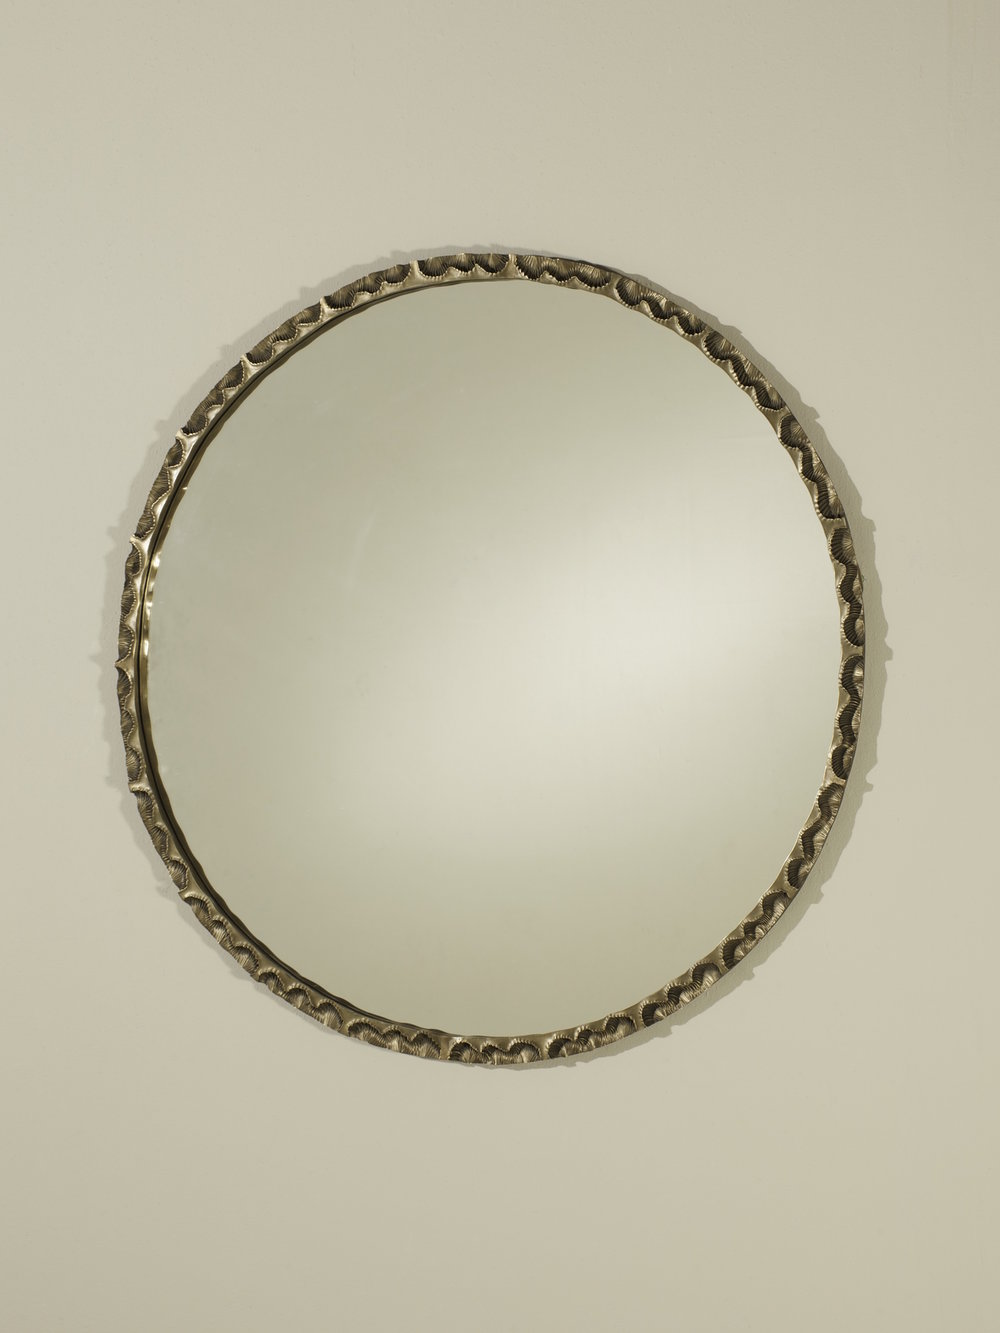 'Spirifer' - round 2013    Bronze, float glass    830 mm diameter 30 mm deep    Ed of 5 - 3 AP